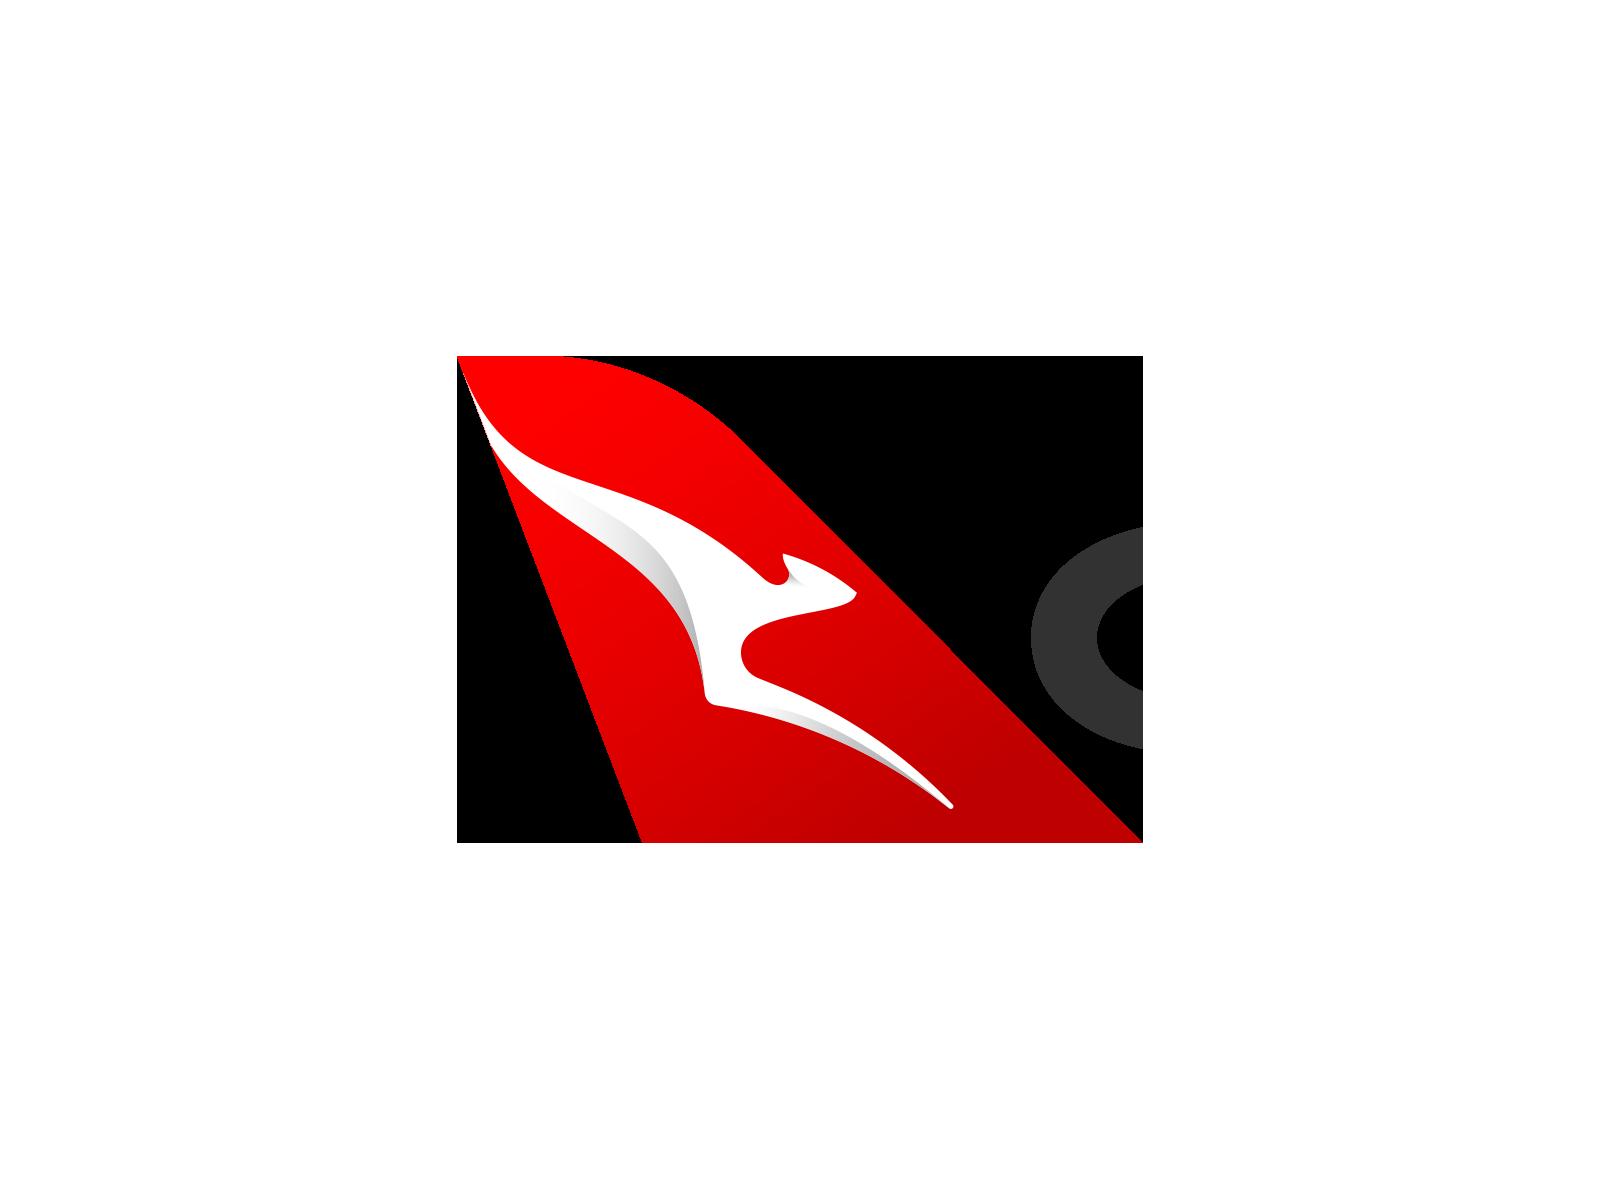 Qantas logo.